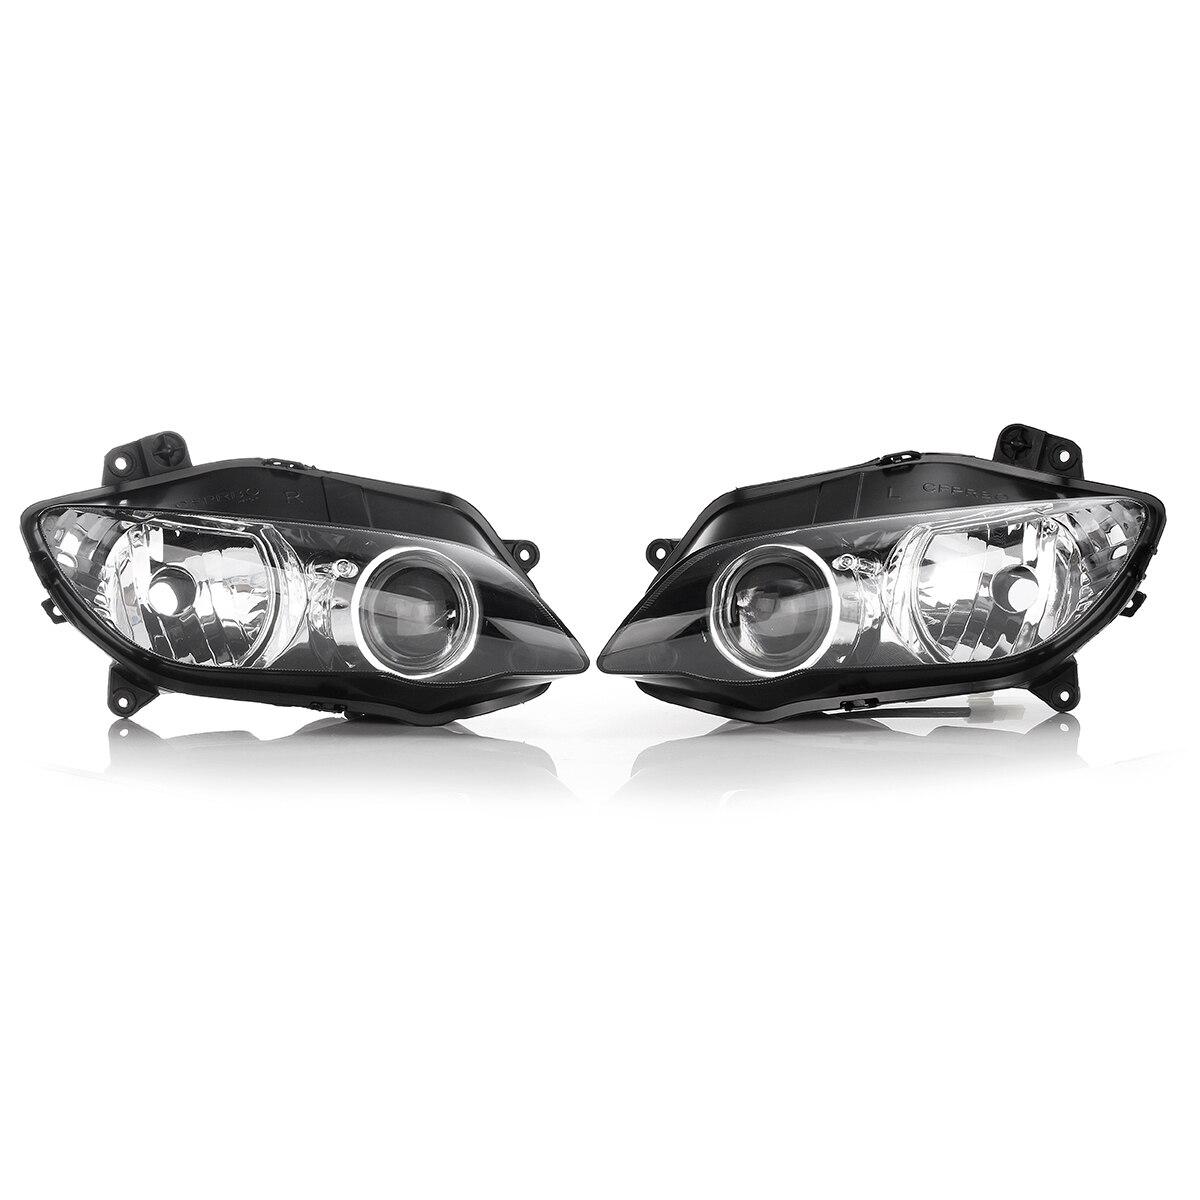 1 paire Objectif Clair Moto Head Light Lampe Avant Phare Phare Assemblée Pour Yamaha YZF R1 2004 2005 2006